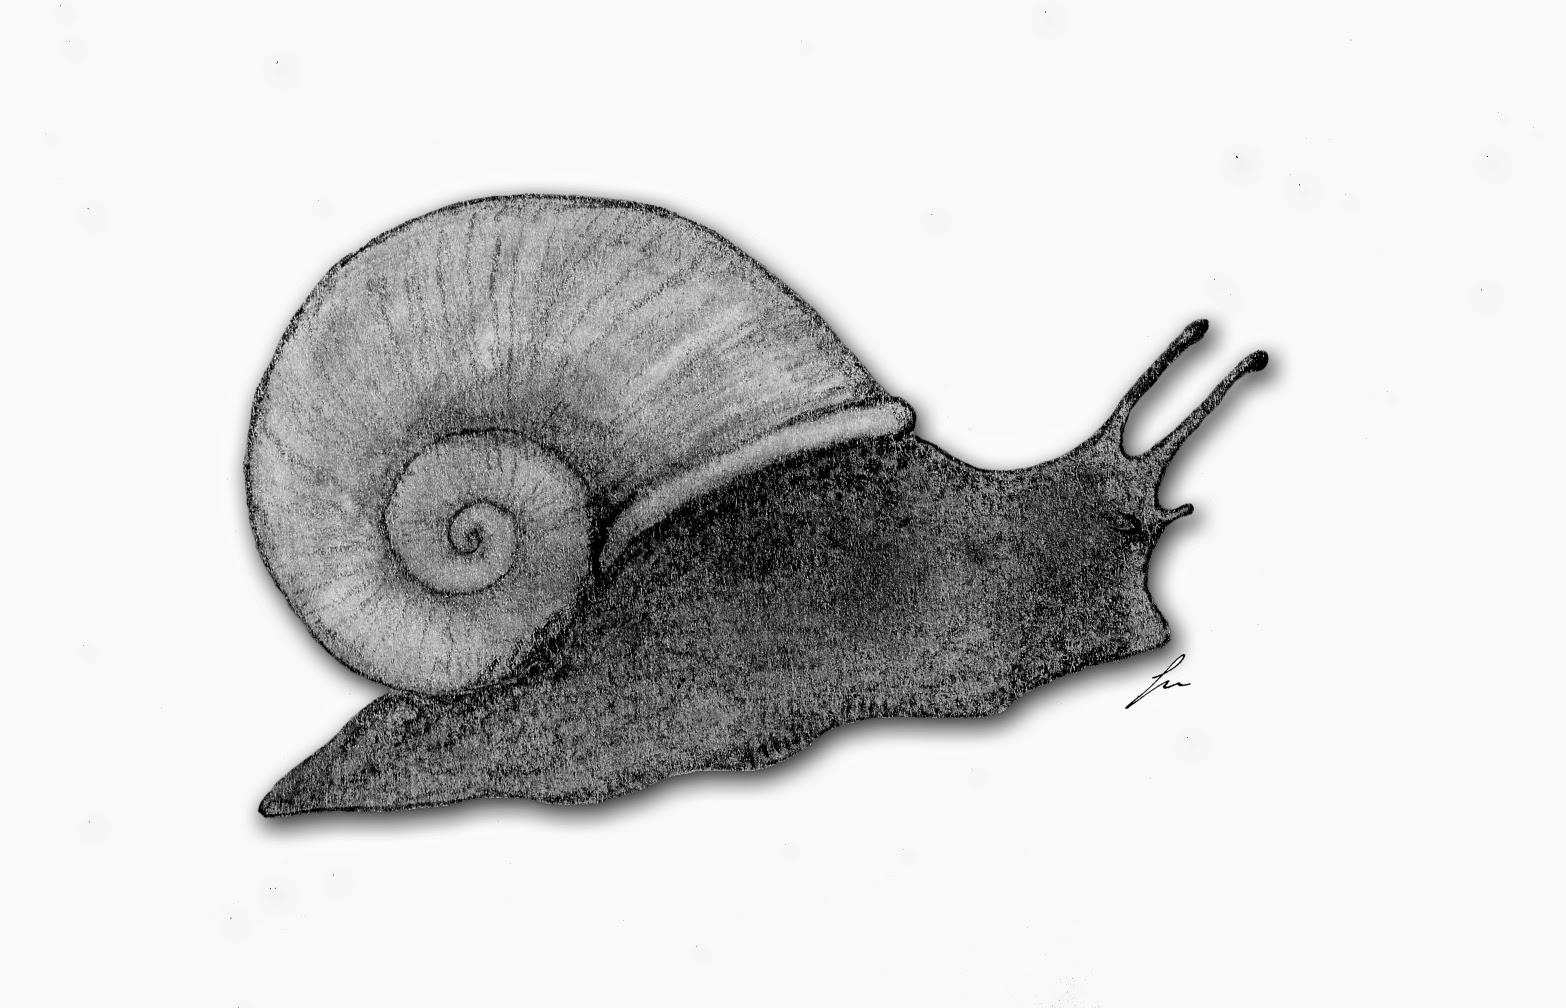 El Pakozoico, paleontología y frikismo: mayo 2014